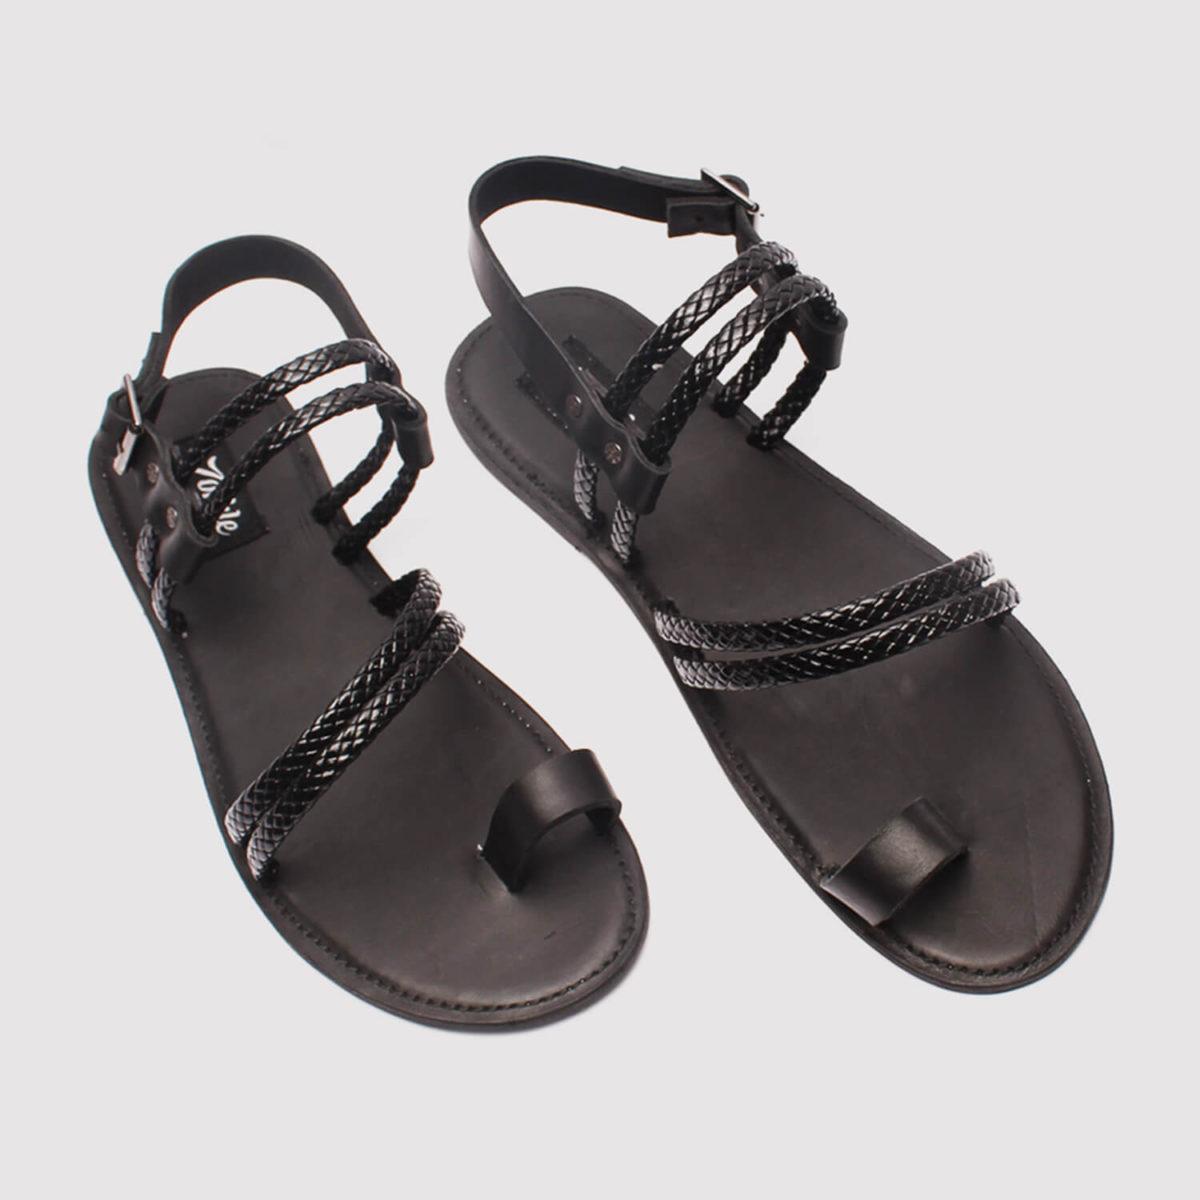 morsi black leather sandals zorkle shoes lagos nigeria